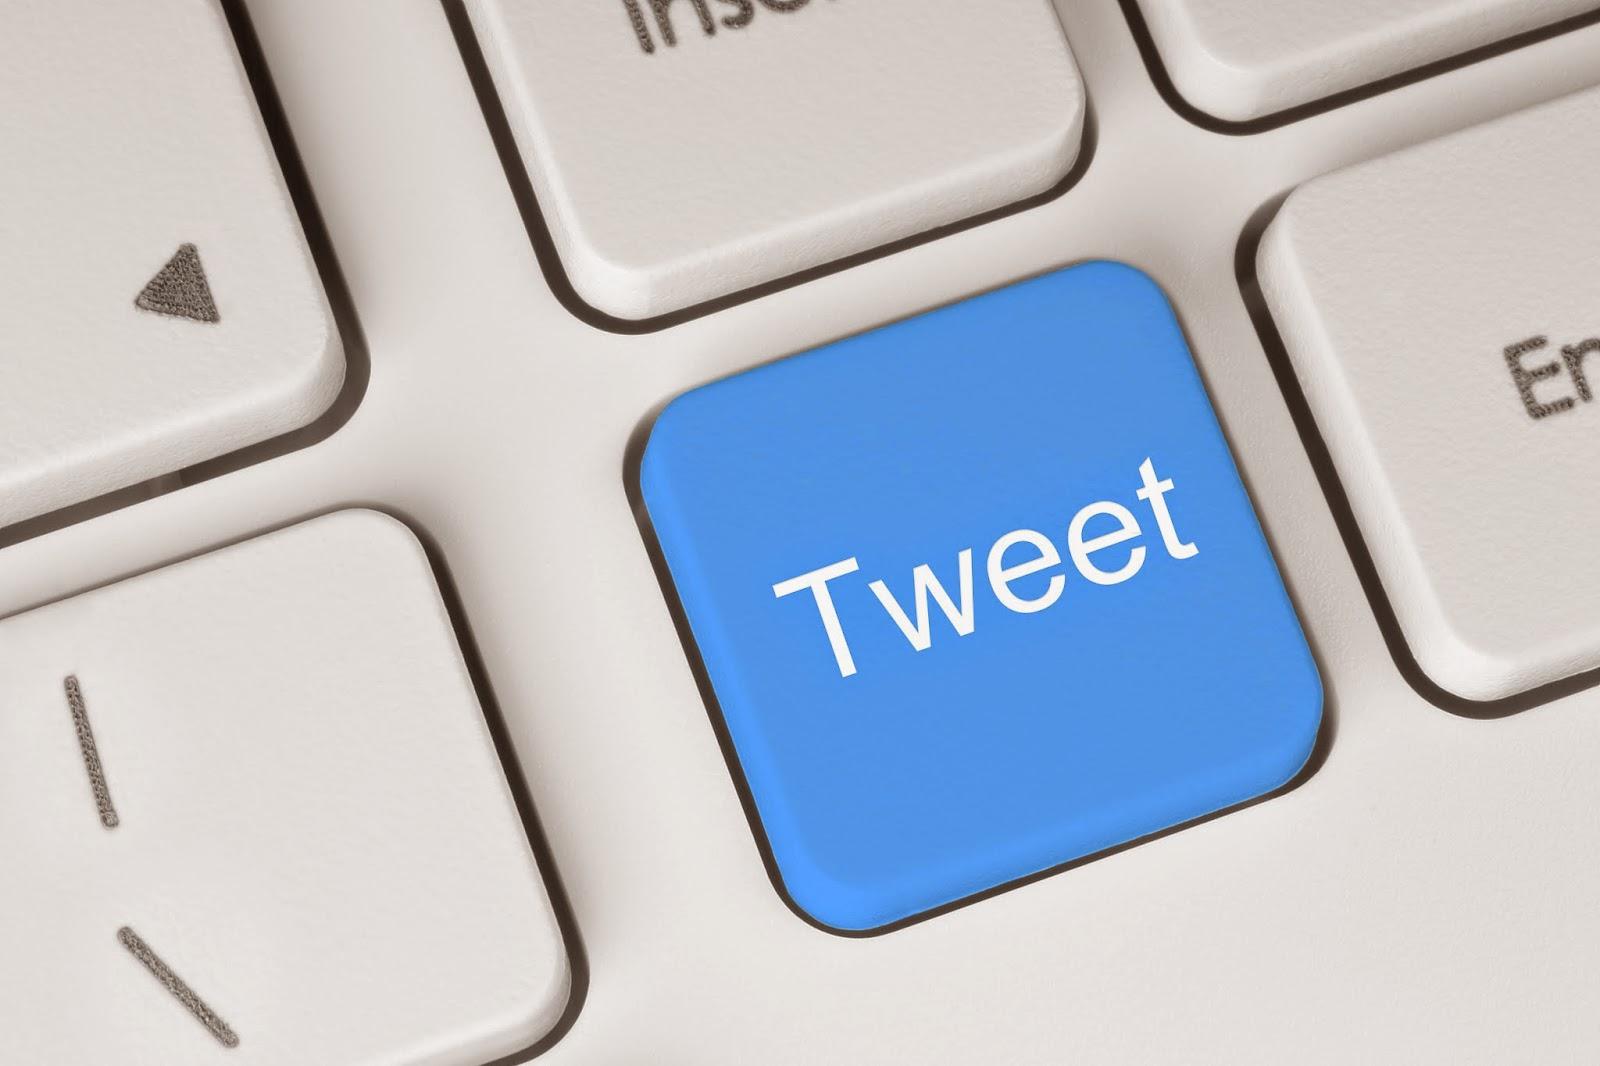 Tweet button on computer keyboard